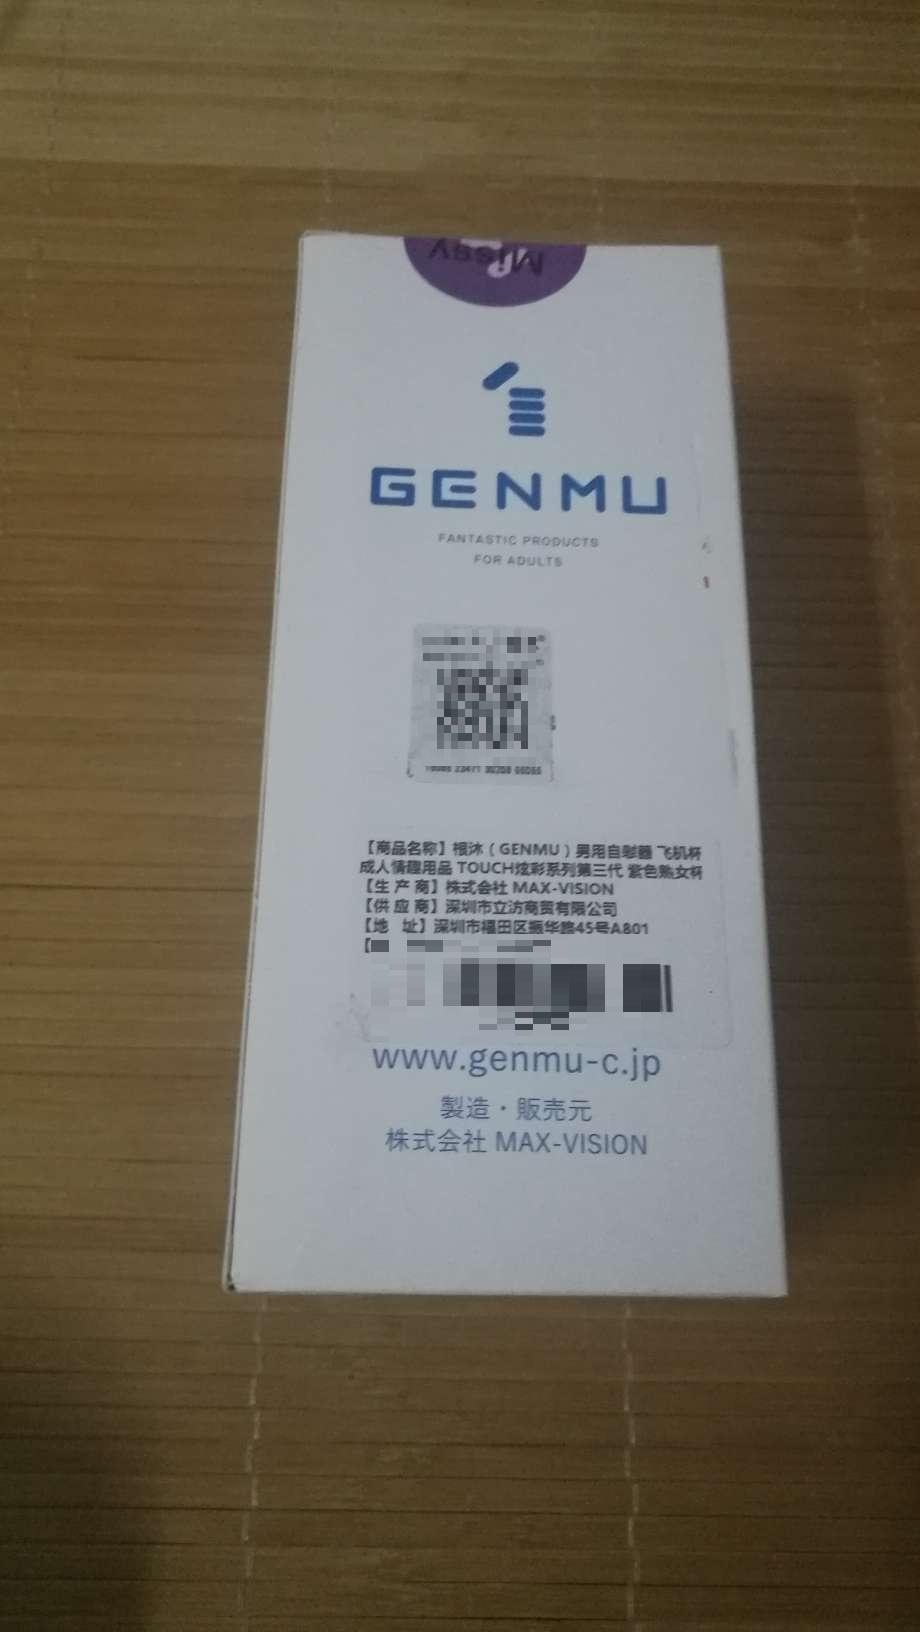 air max 1 green and white 002108348 shop